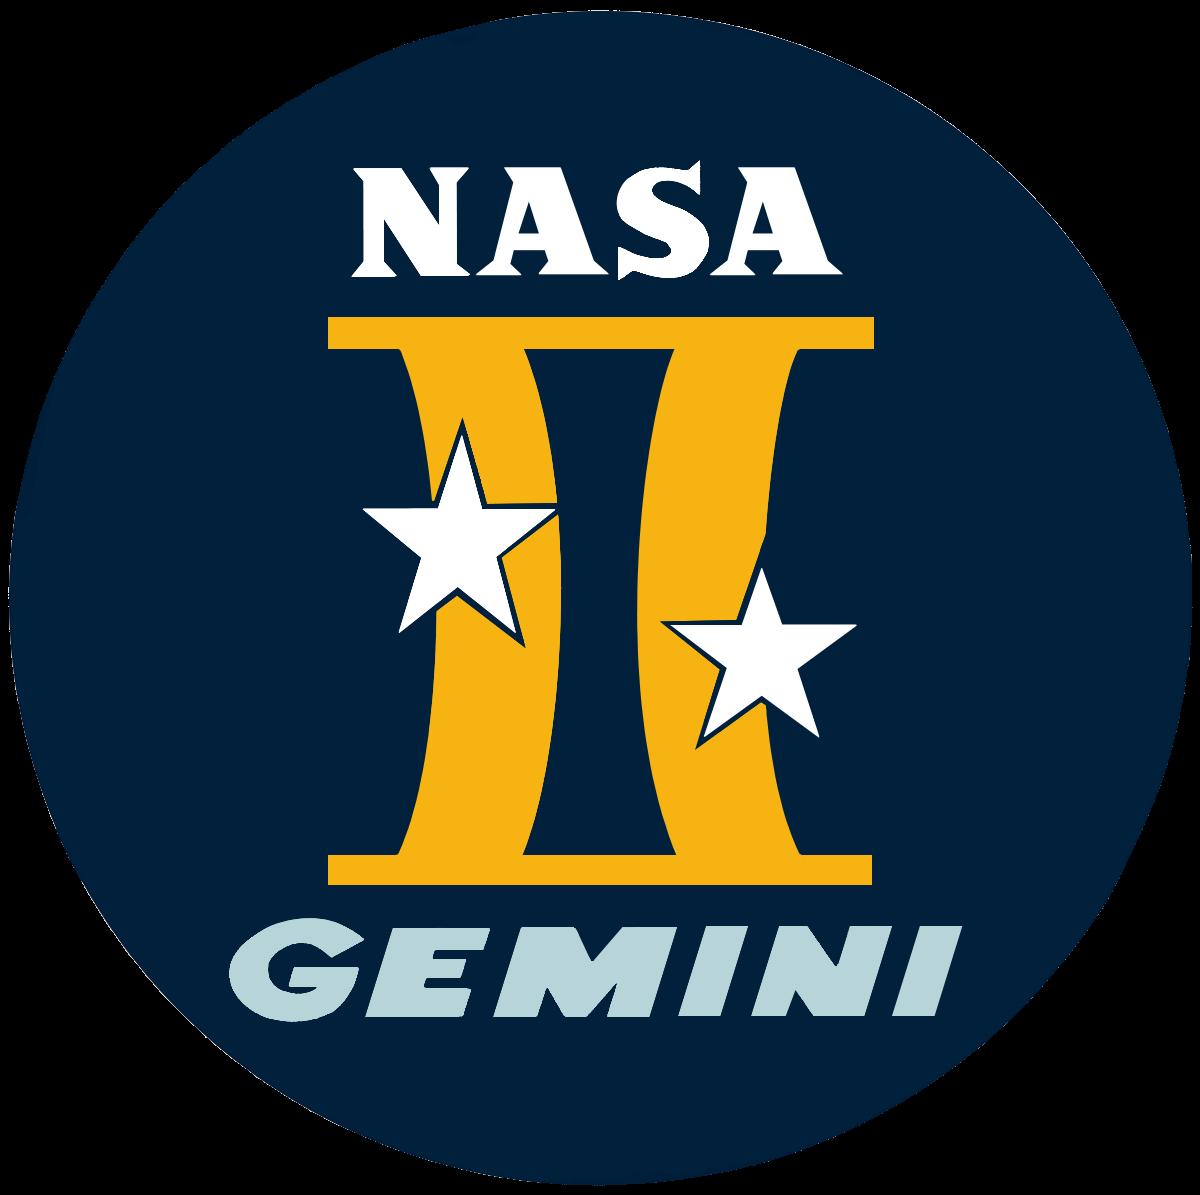 Project Gemini Wikipedia, the free encyclopedia